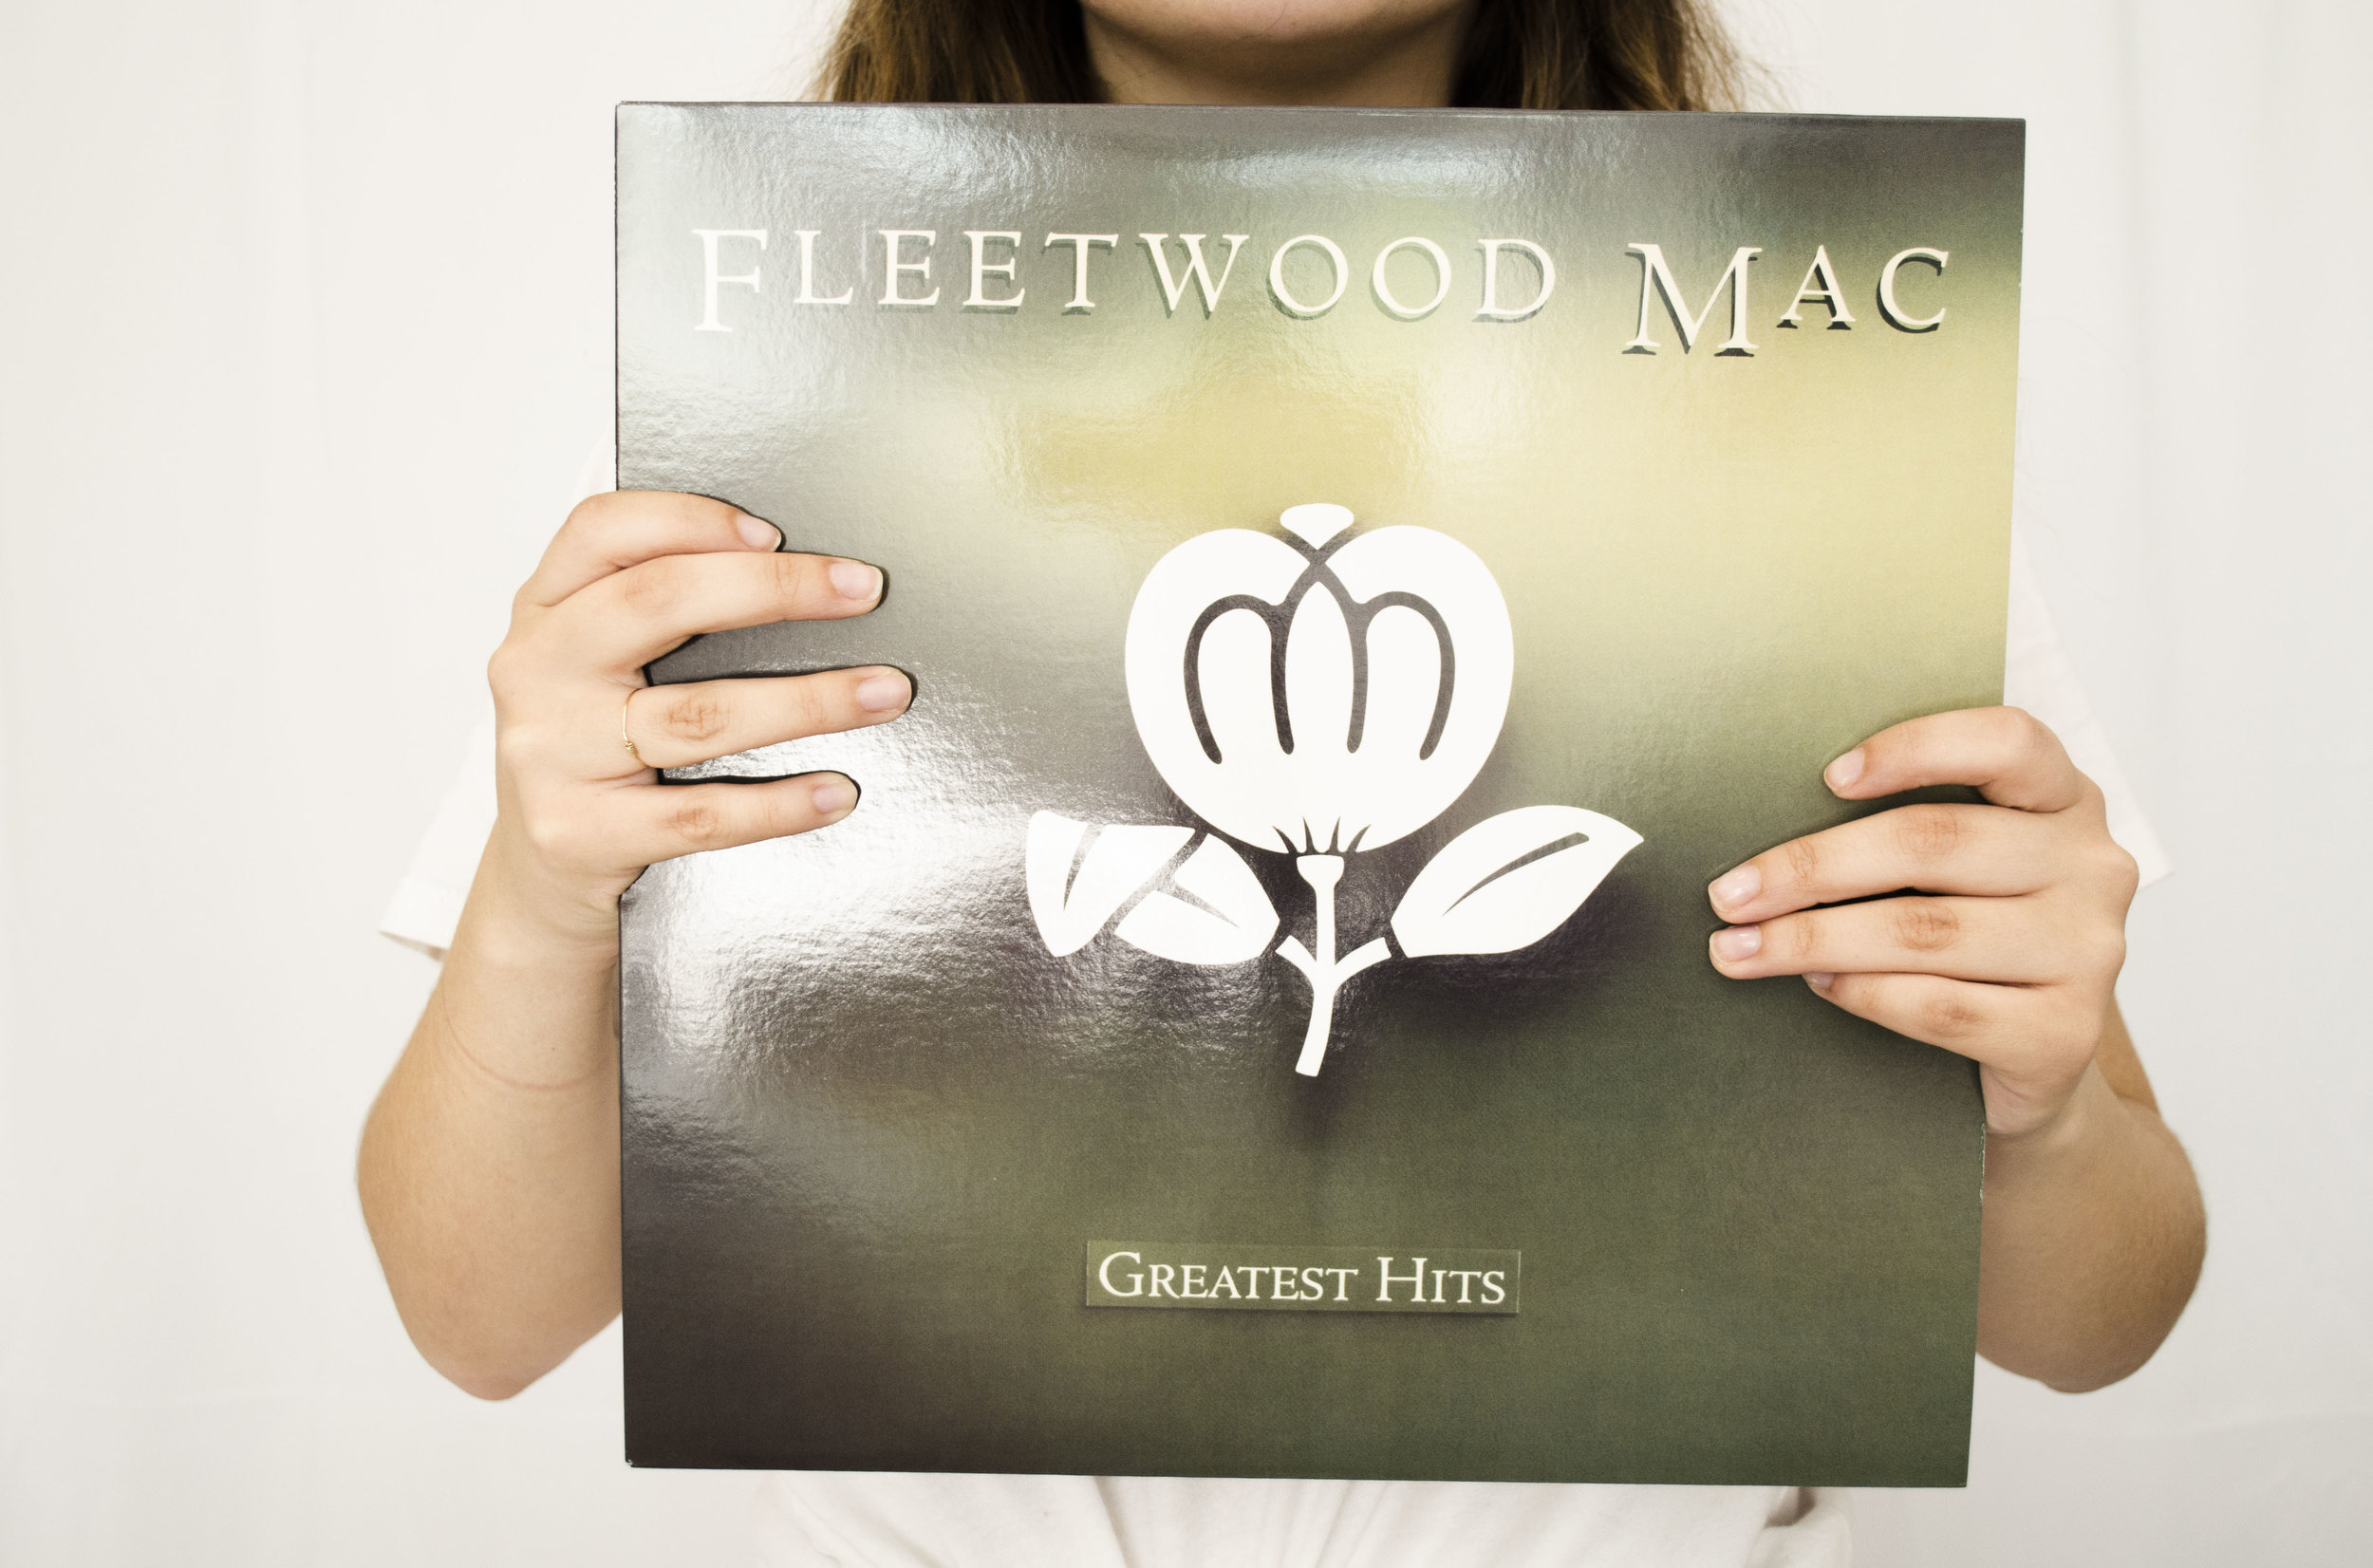 Greatest Hits  - by Fleetwood Mac